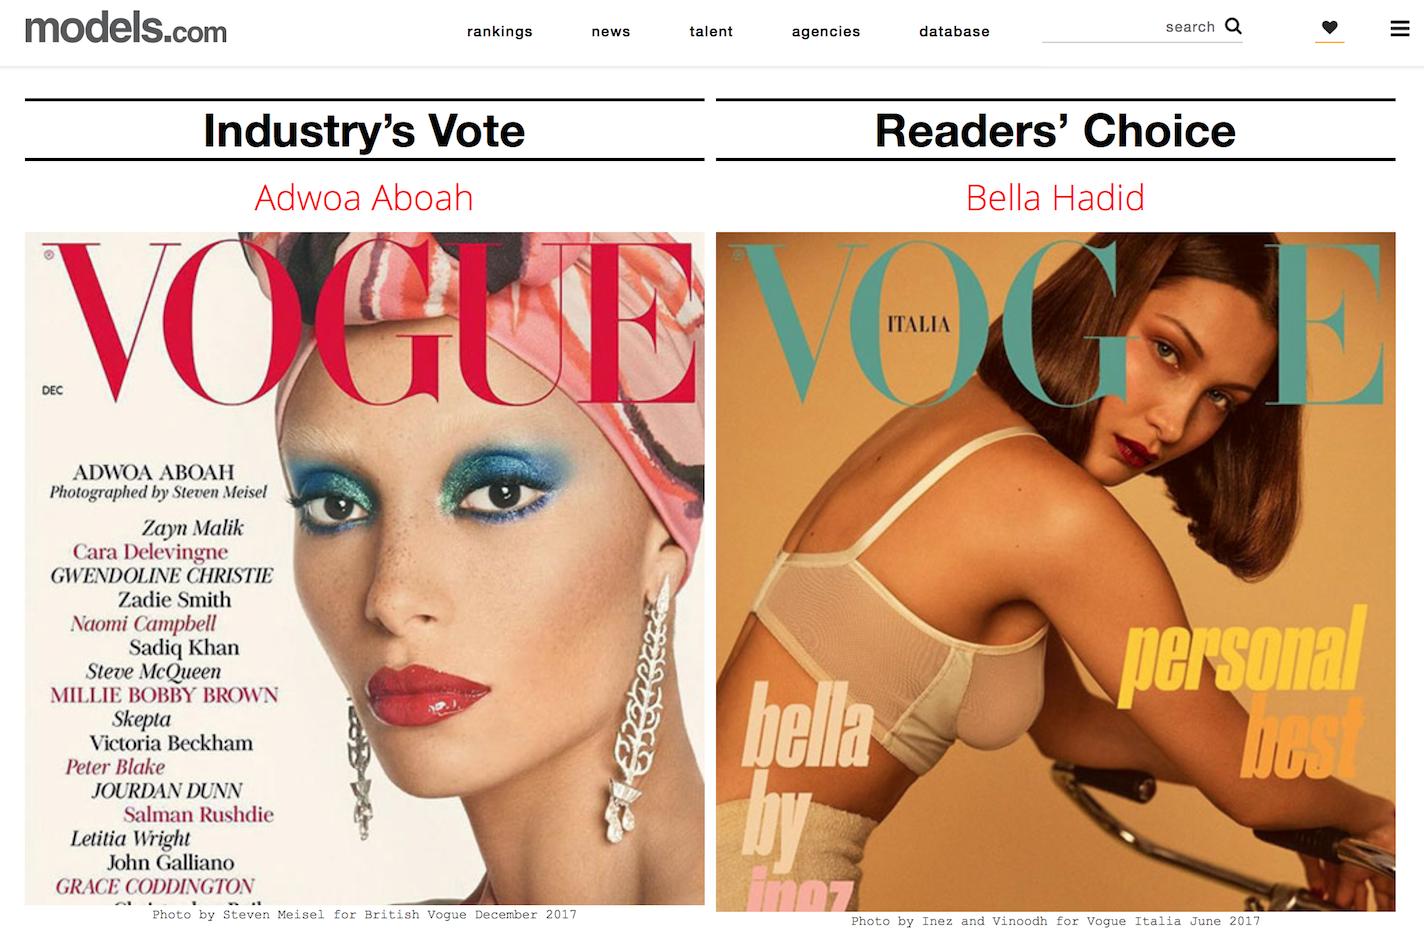 "Models.com 2017年度模特大奖名单揭晓,Paul Hameline、Adwoa Aboah 分别斩获专业人士评选的""年度男女模特""称号"